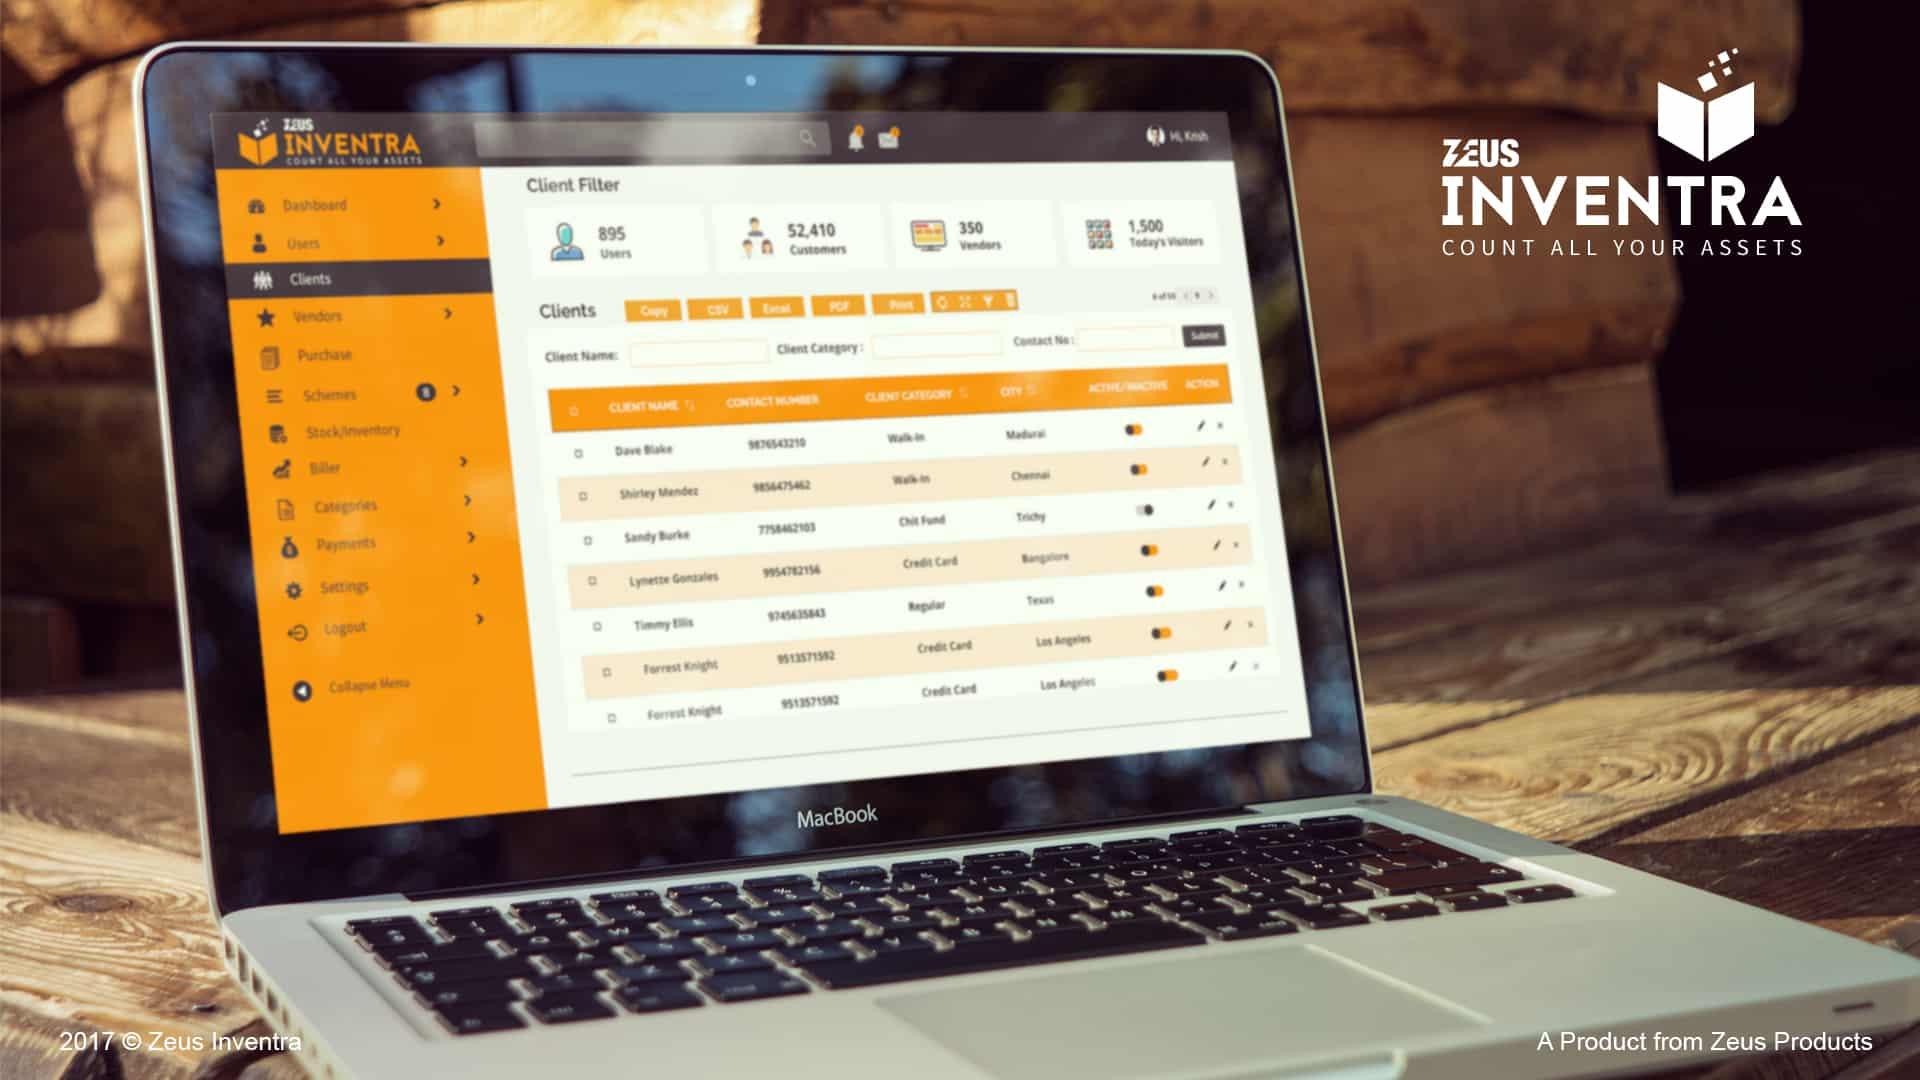 Zeus Inventory management software